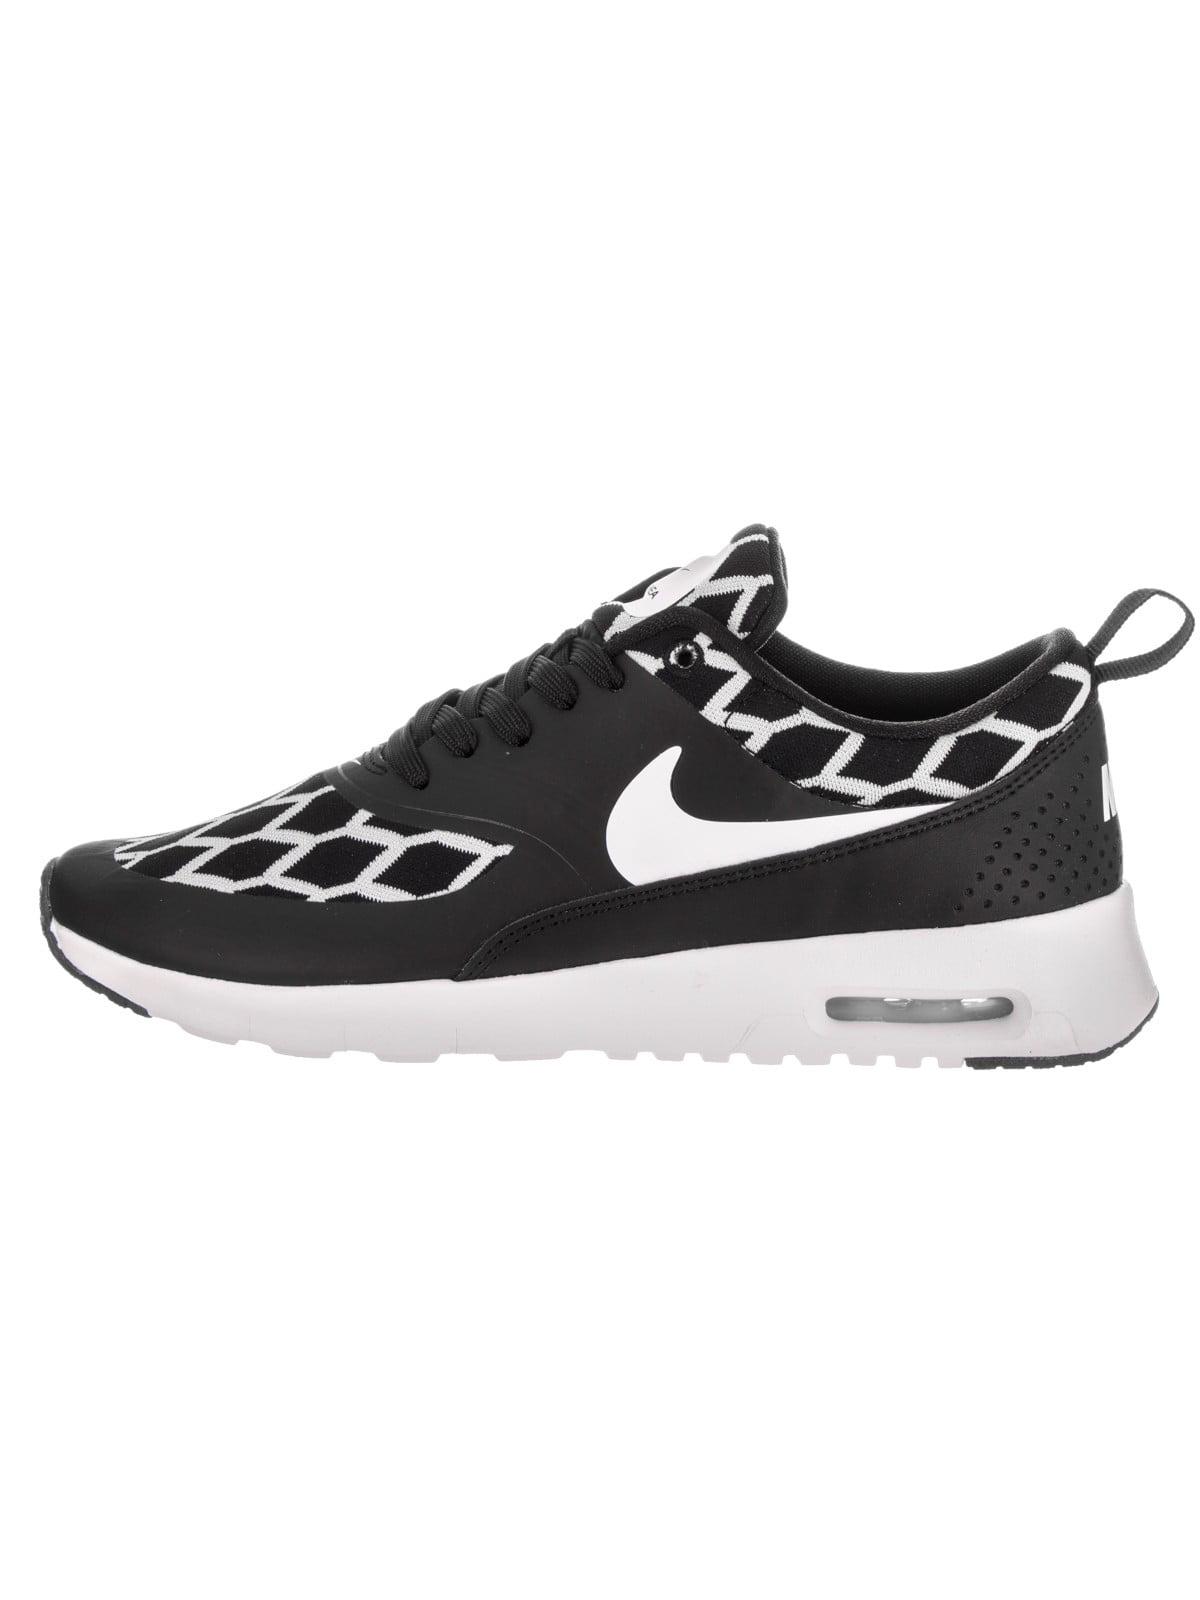 Nike Kids Air Max Thea SE (GS) Running Shoe